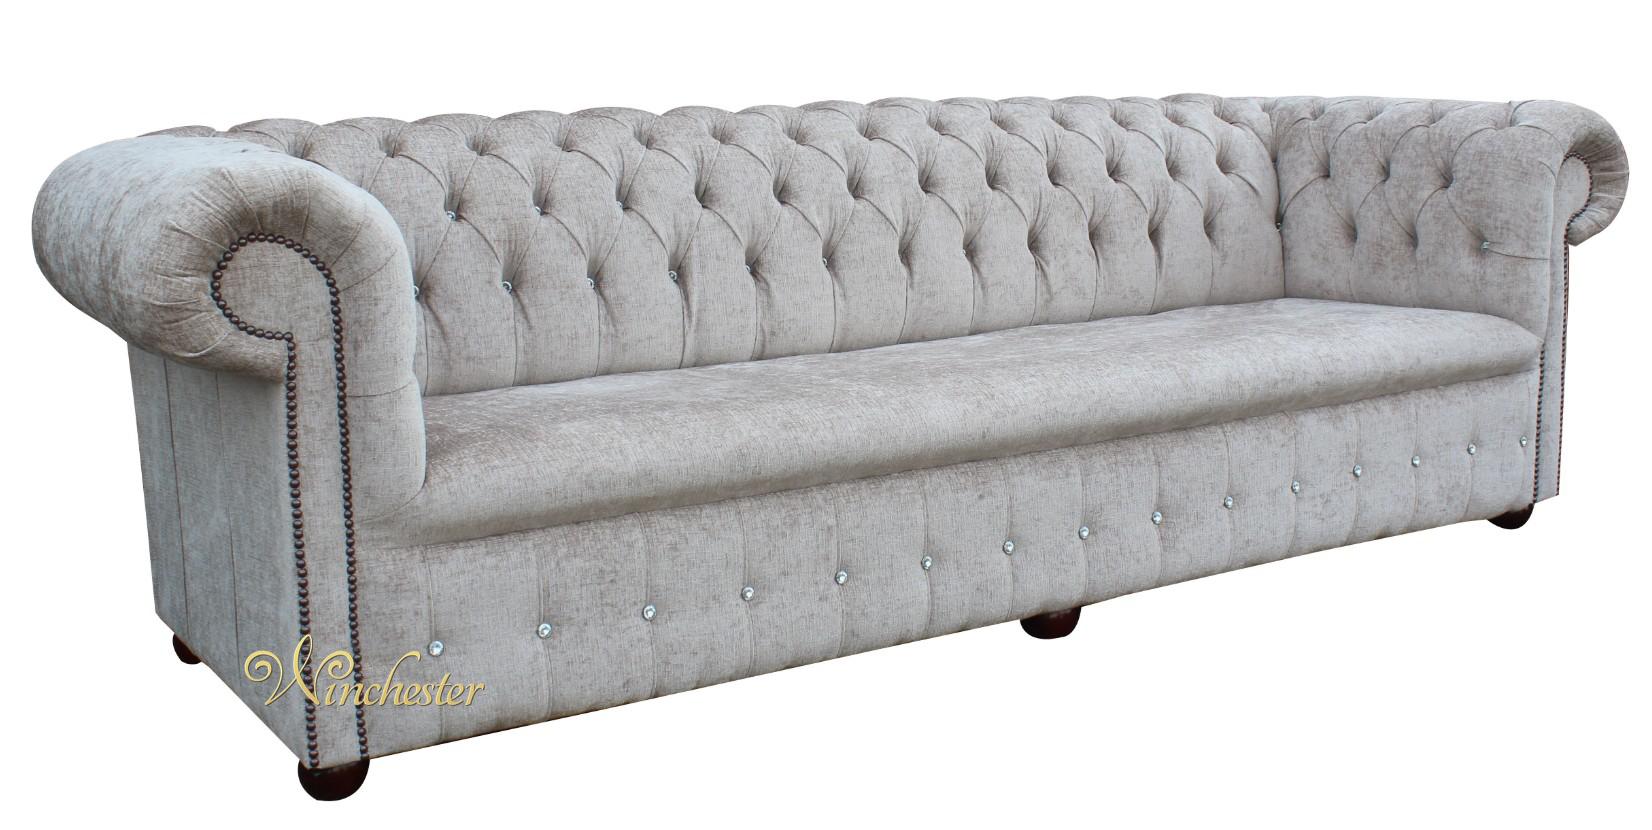 chesterfield 1780 39 s swarovski crystallized diamond 4. Black Bedroom Furniture Sets. Home Design Ideas